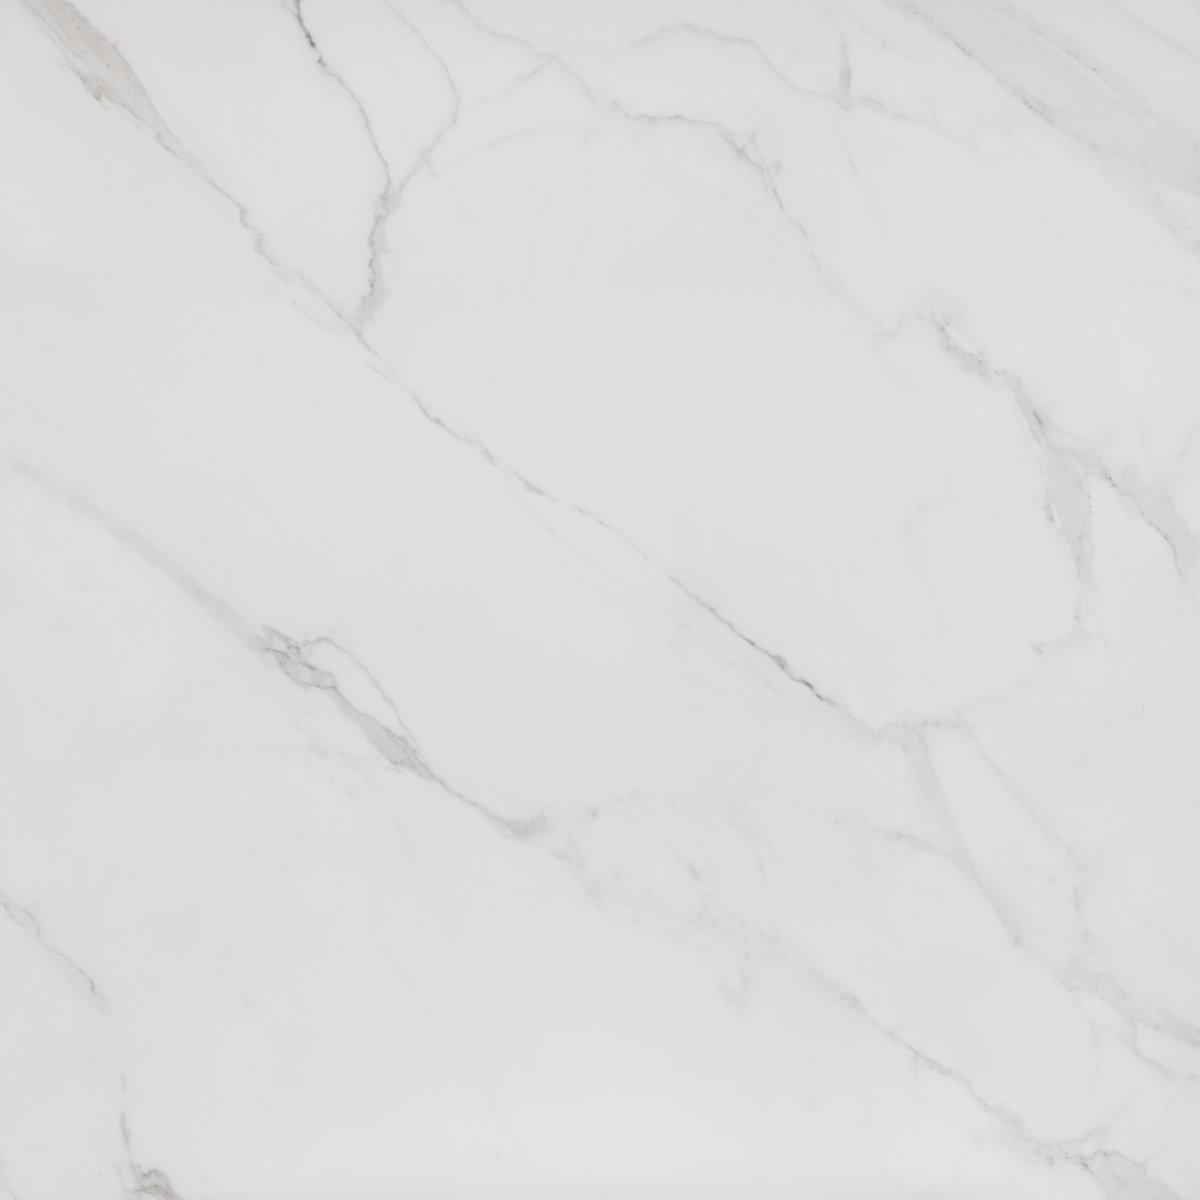 Eli Mont Blanc AC 900x900mm_Stiles_Product3_Image